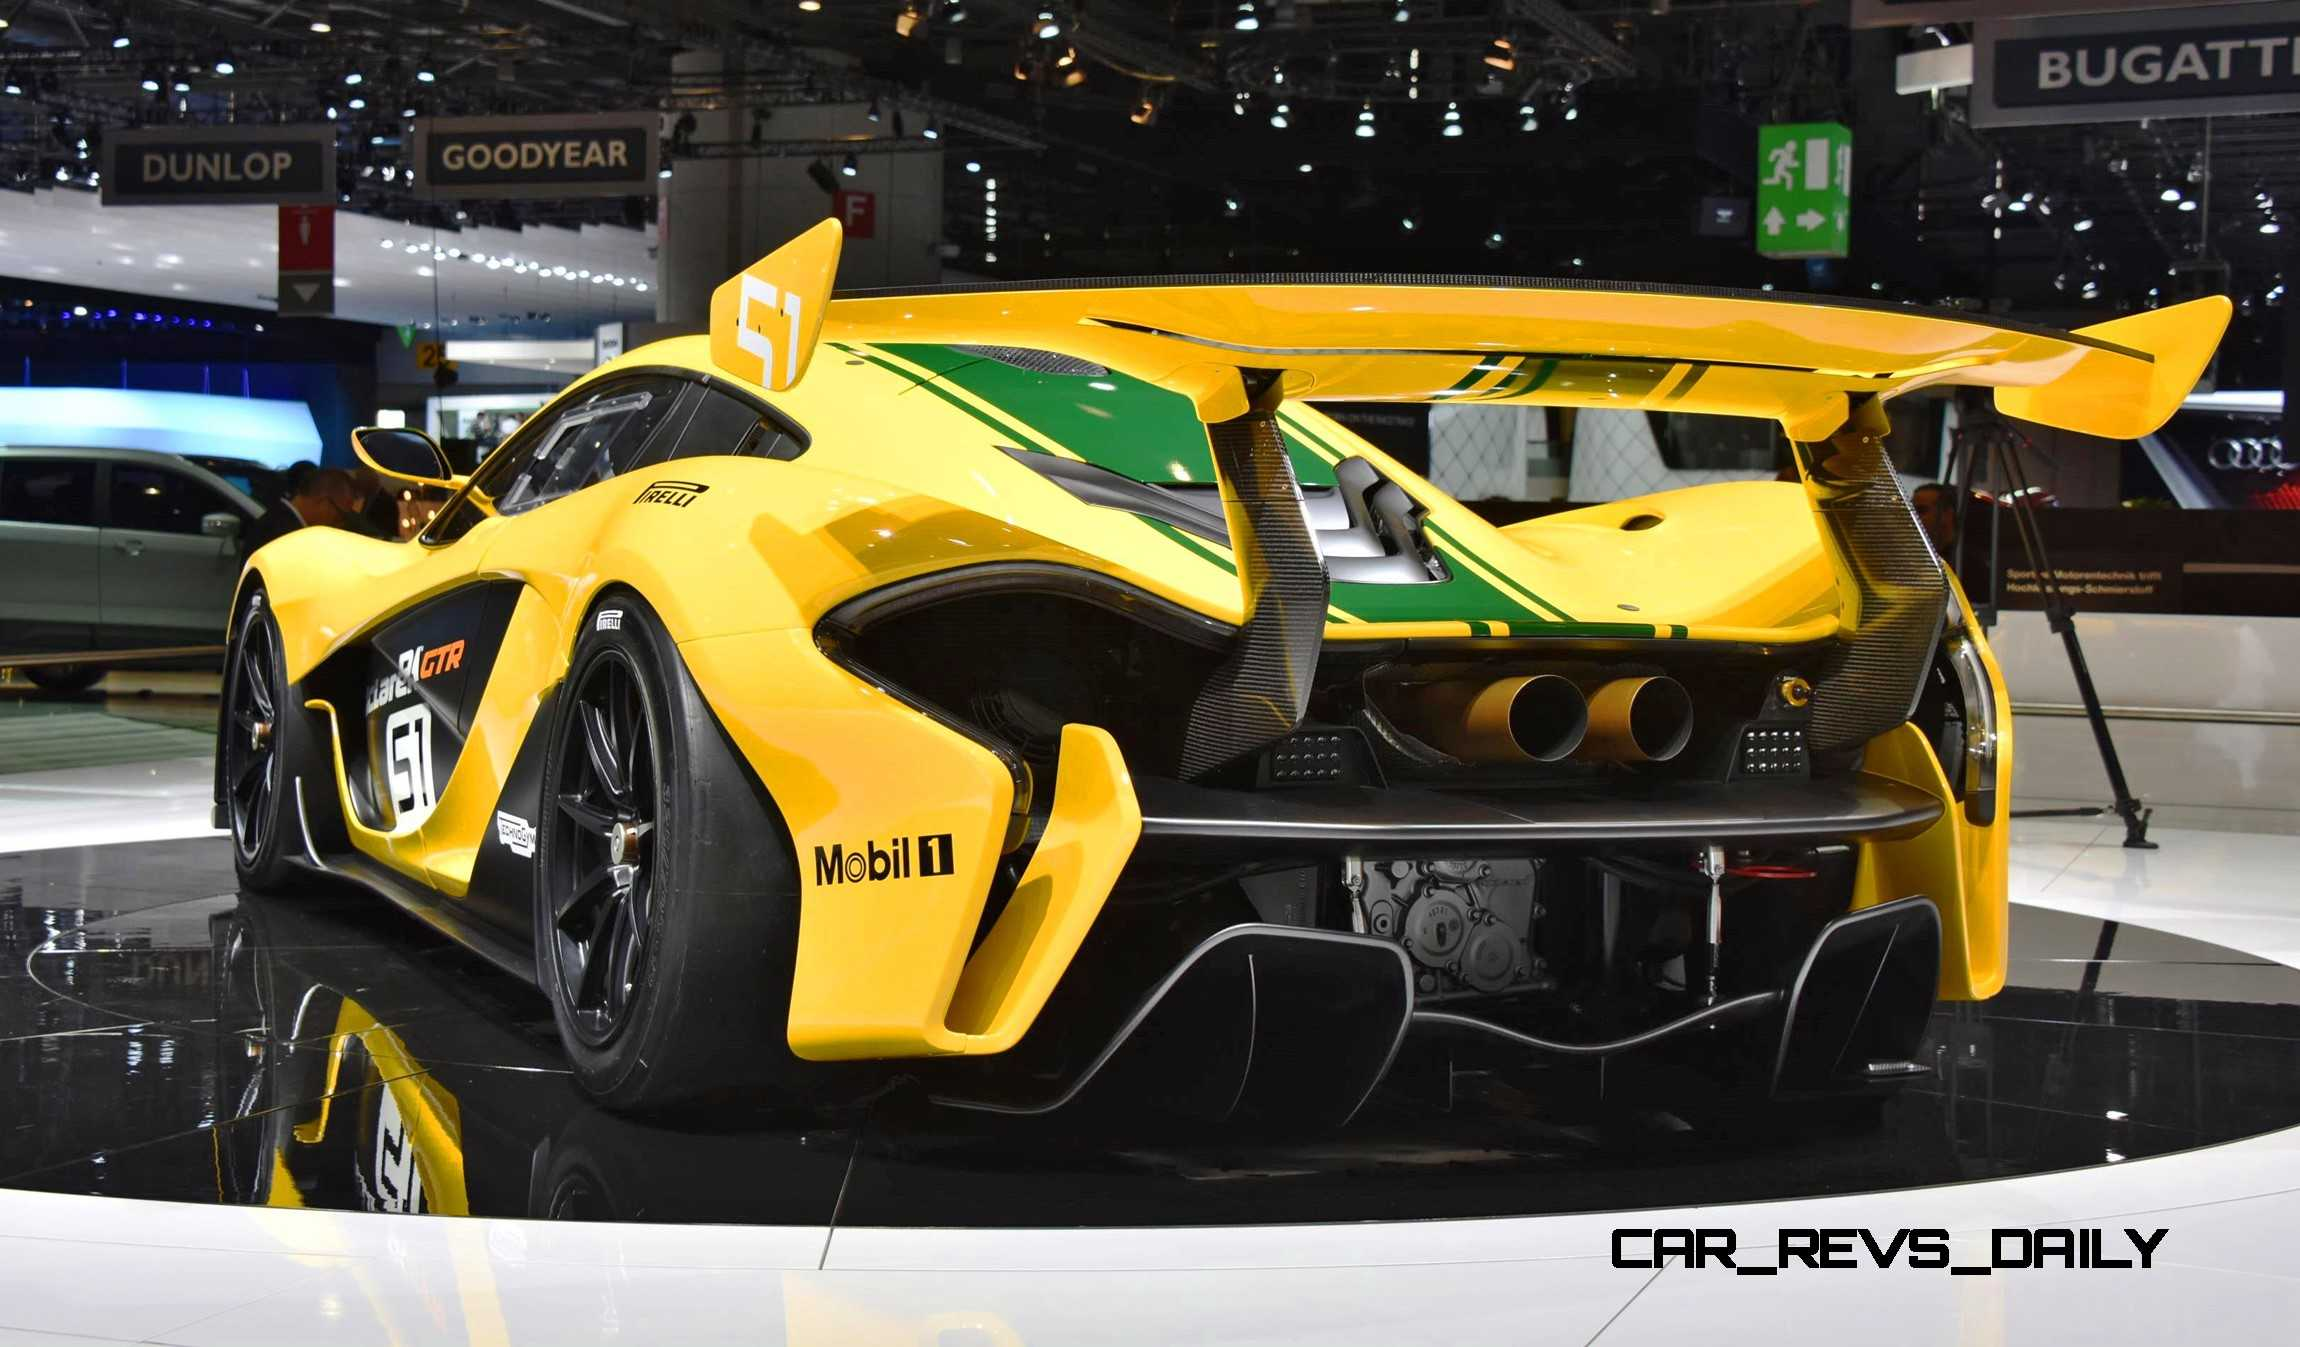 http://www.car-revs-daily.com/wp-content/uploads/2015/03/2016-McLaren-P1-GTR-Meets-1997-McLaren-F1-GT-LongTail-In-Geneva-16.jpg